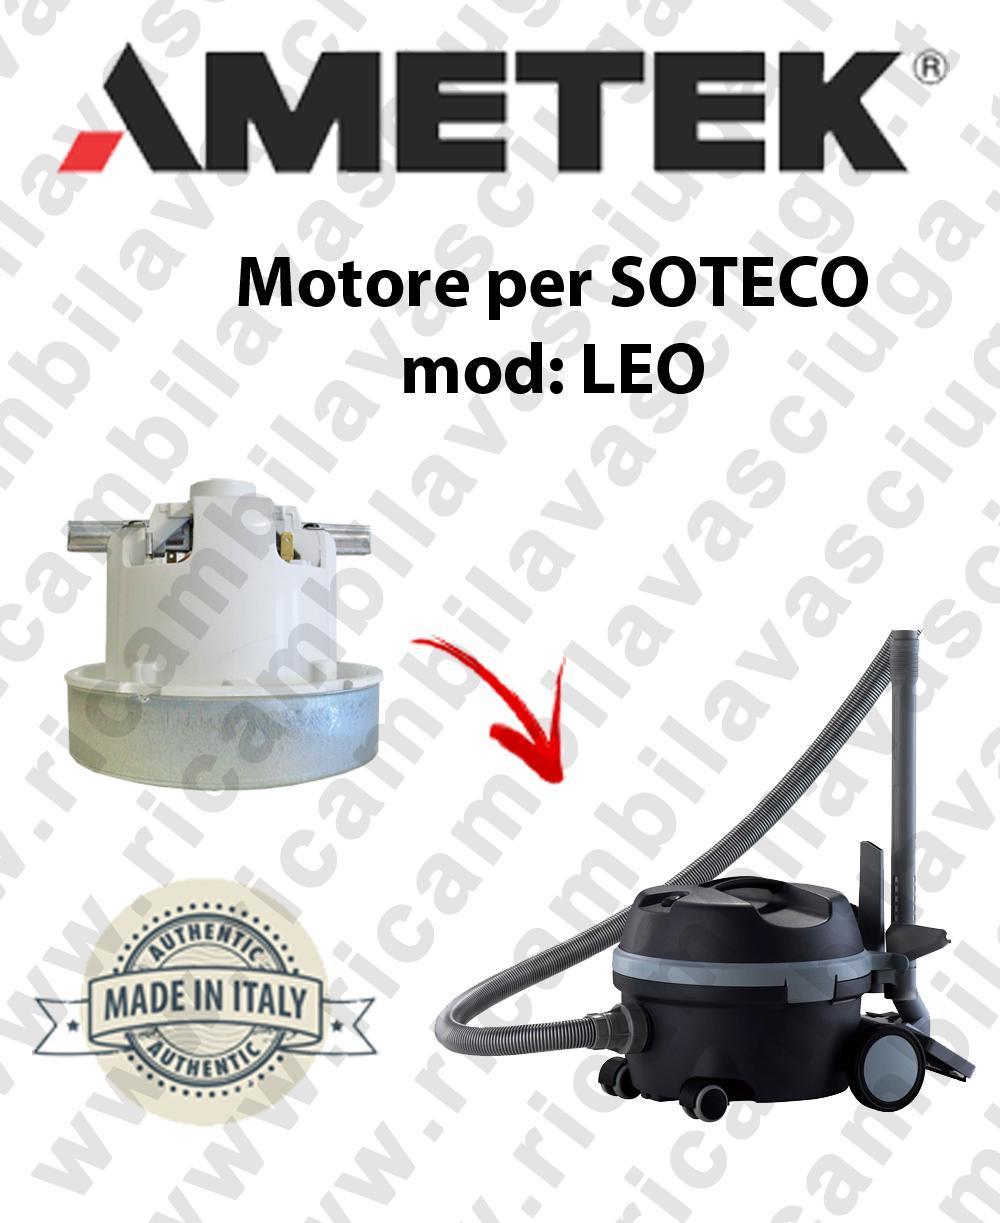 LEO Ametek Vacuum Motor for vacuum cleaner SOTECO